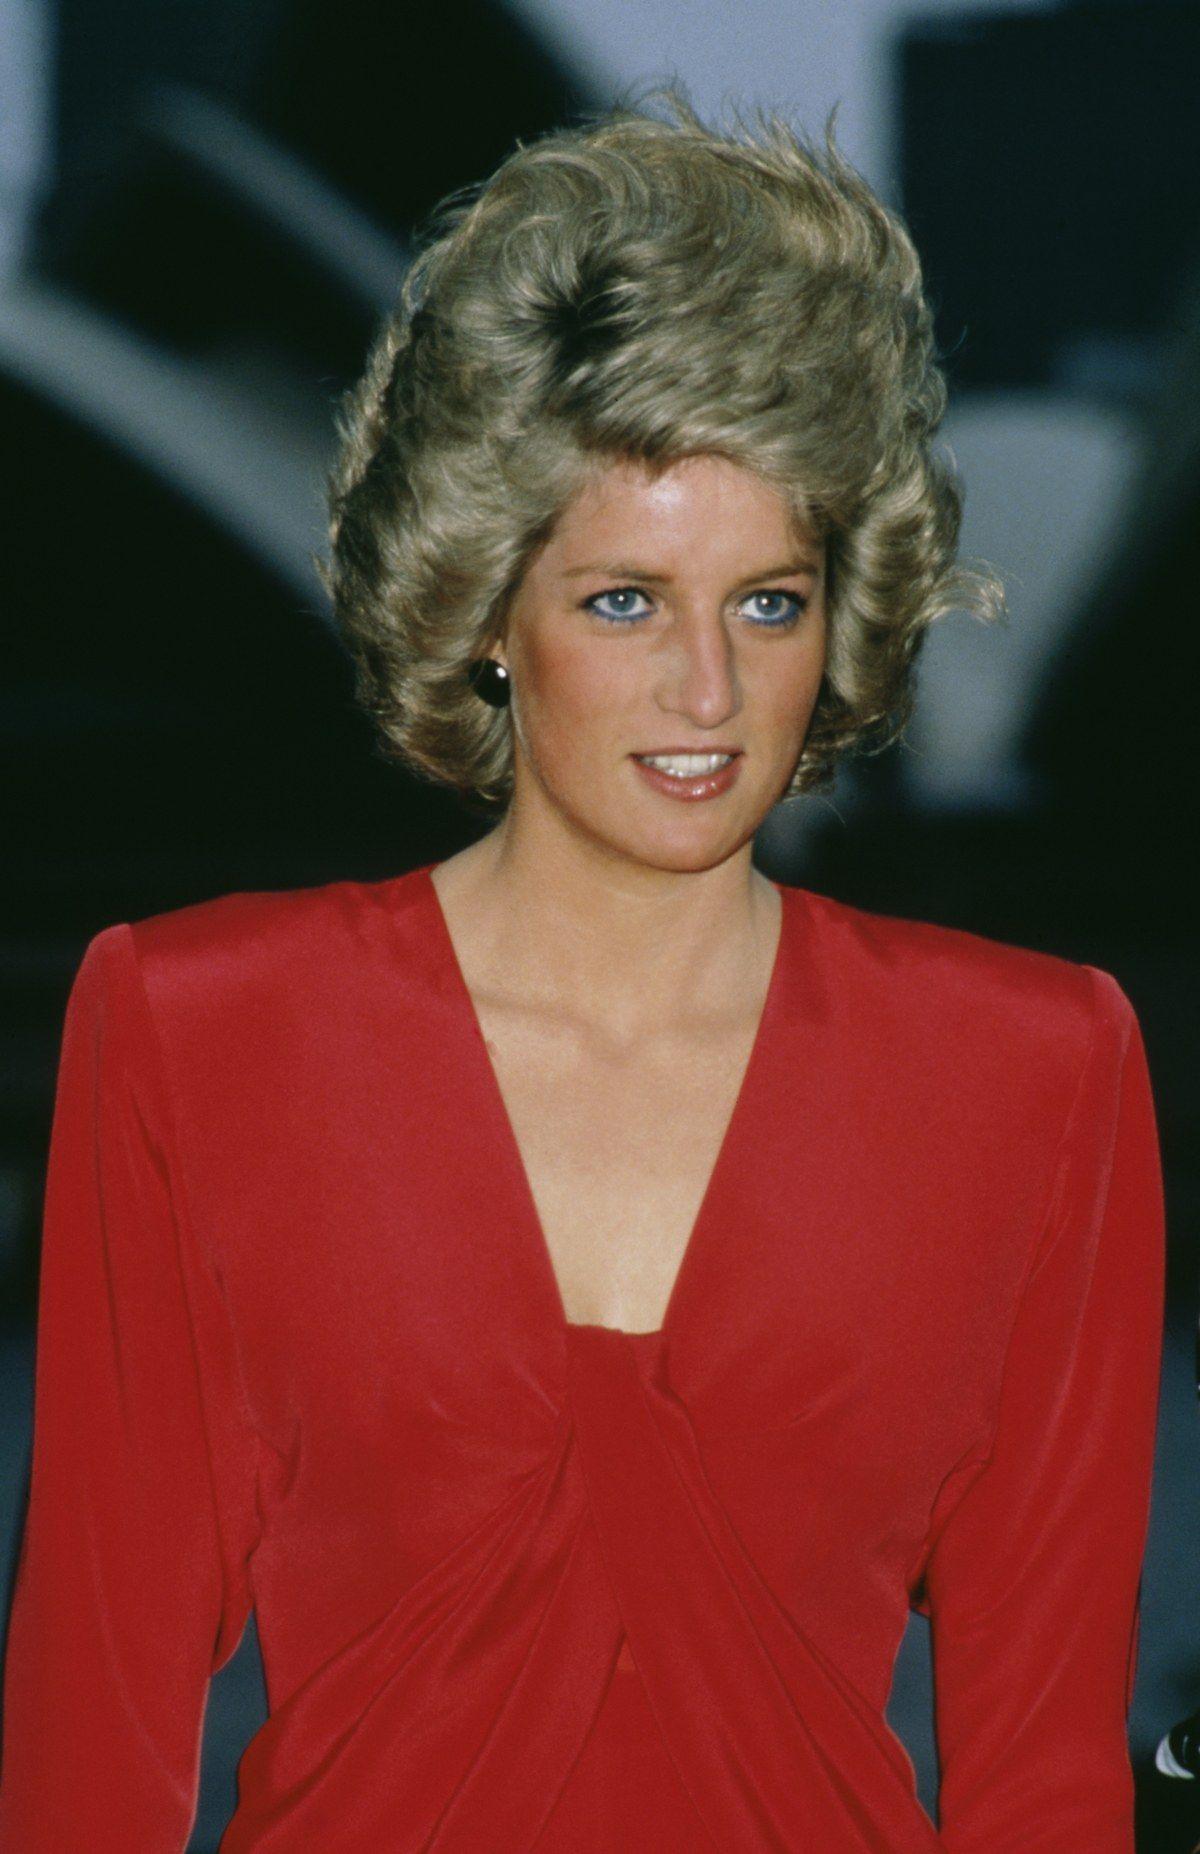 50 Rare Photos of Princess Diana That Reveal What Her Life